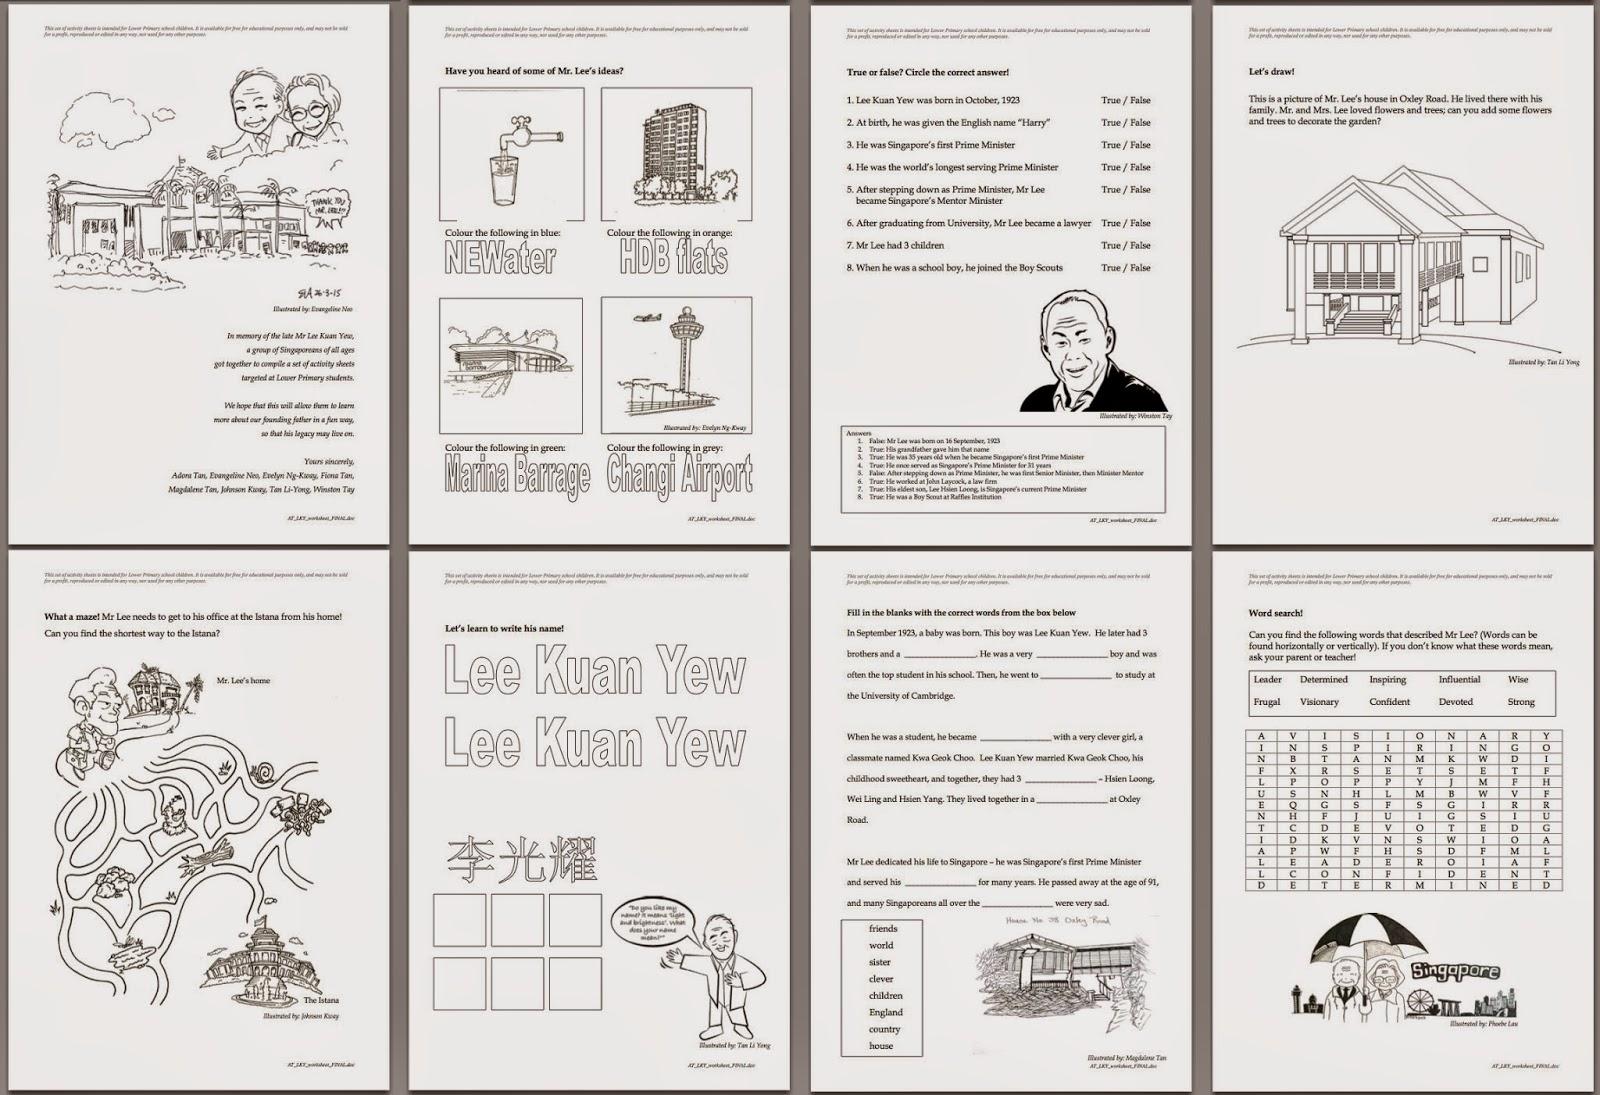 Evacomics Blog Tribute To Mr Lee Kuan Yew And His Wife